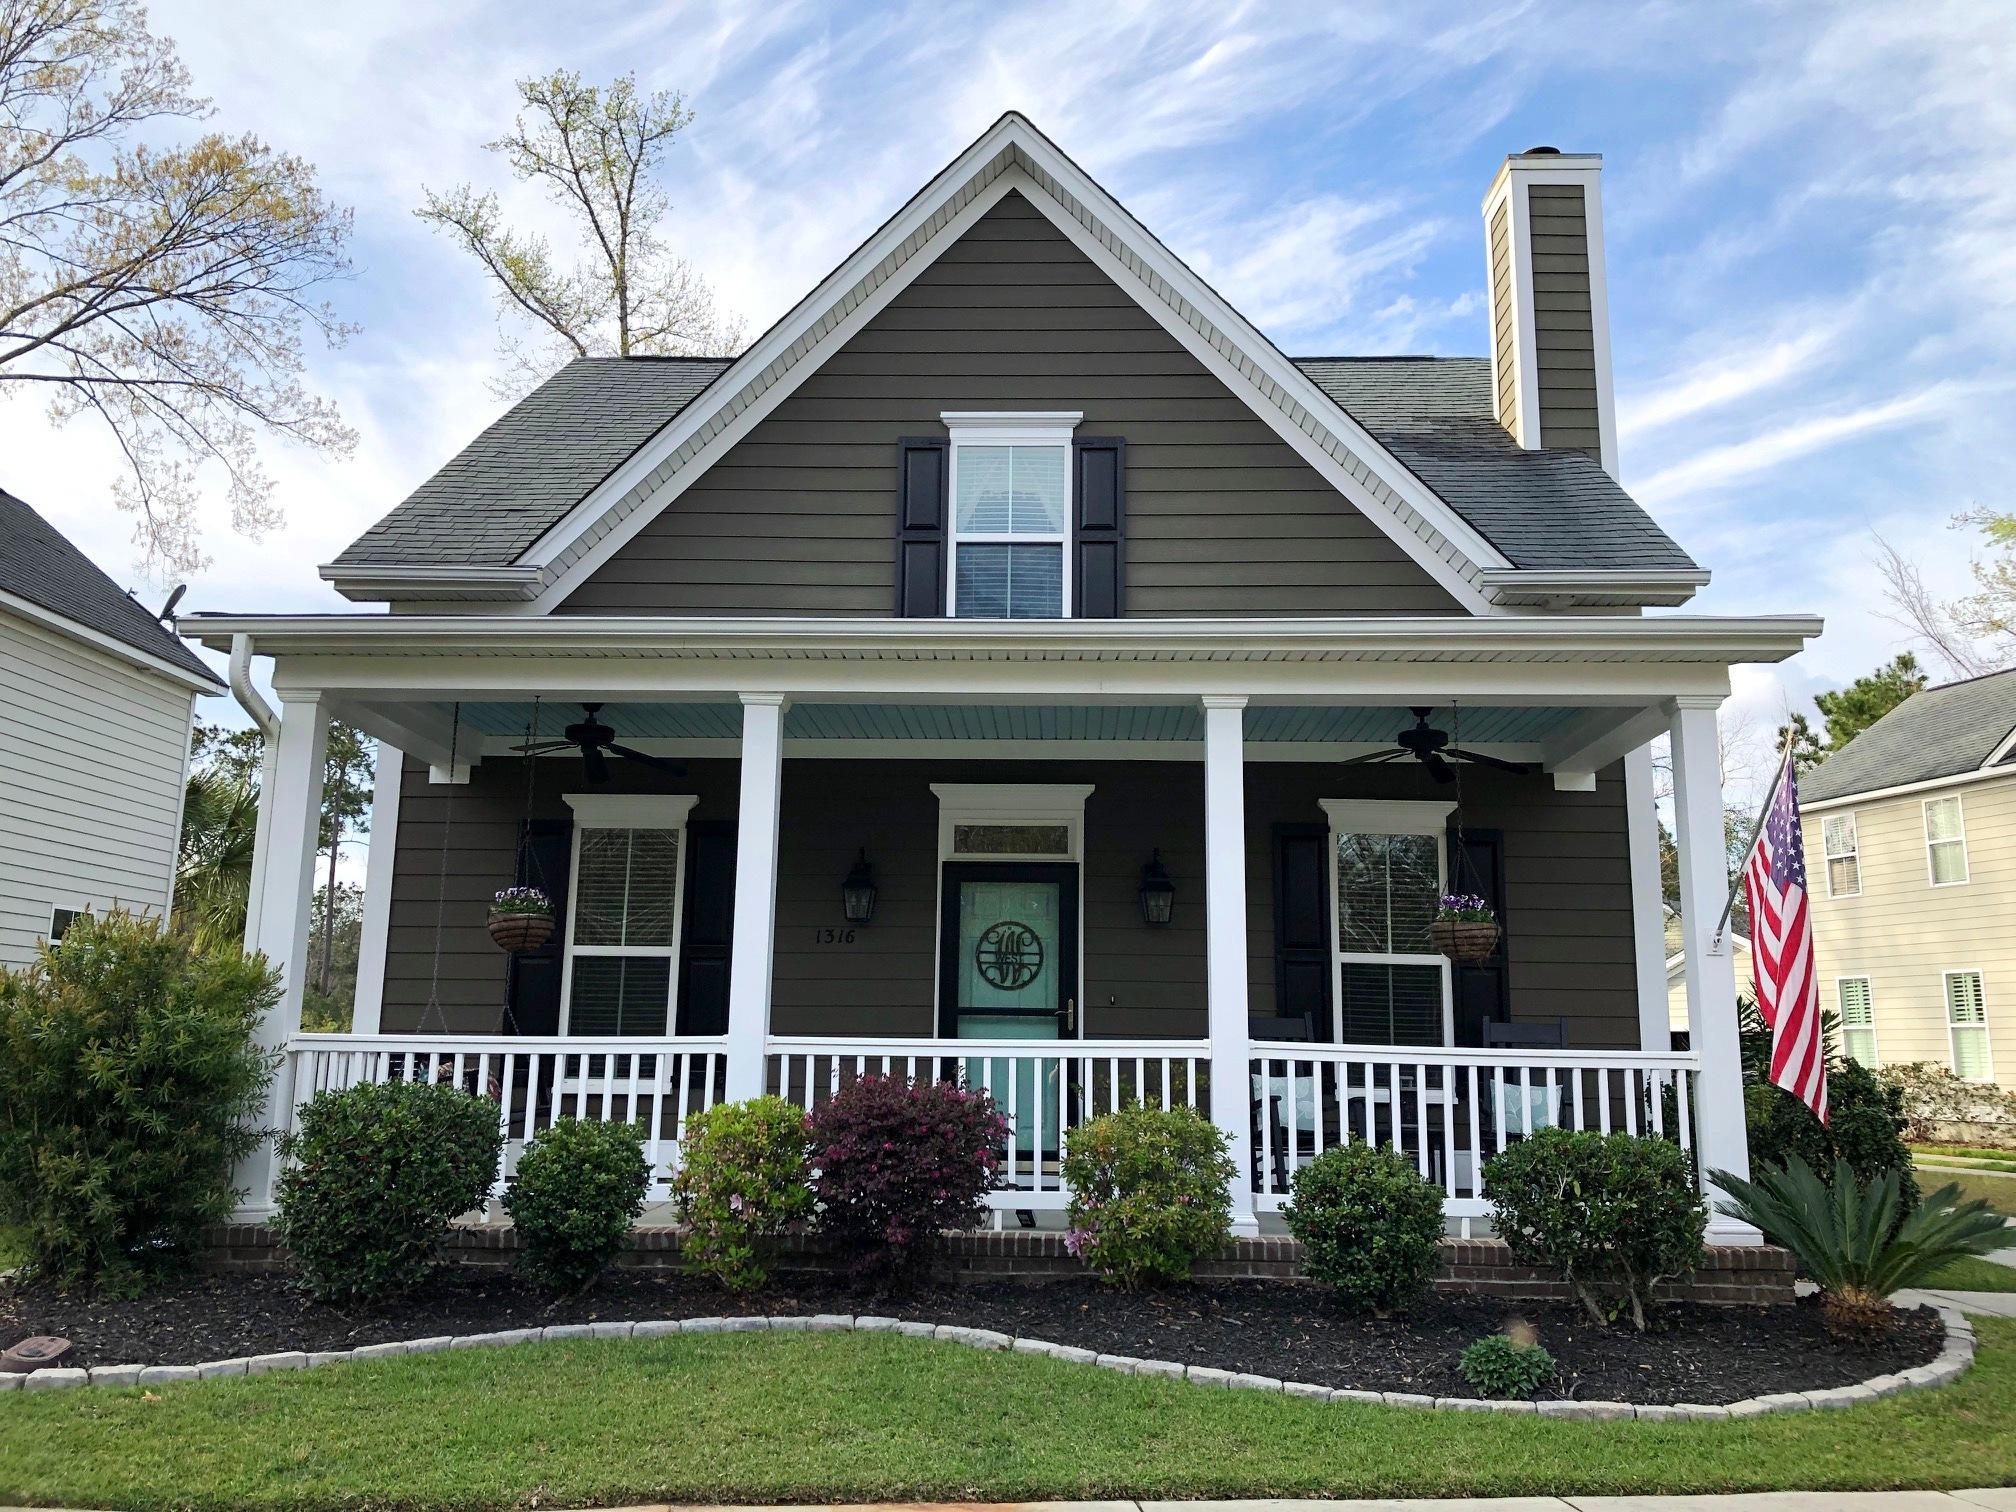 Carol Oaks Homes For Sale - 1316 Carol Oaks, Mount Pleasant, SC - 7